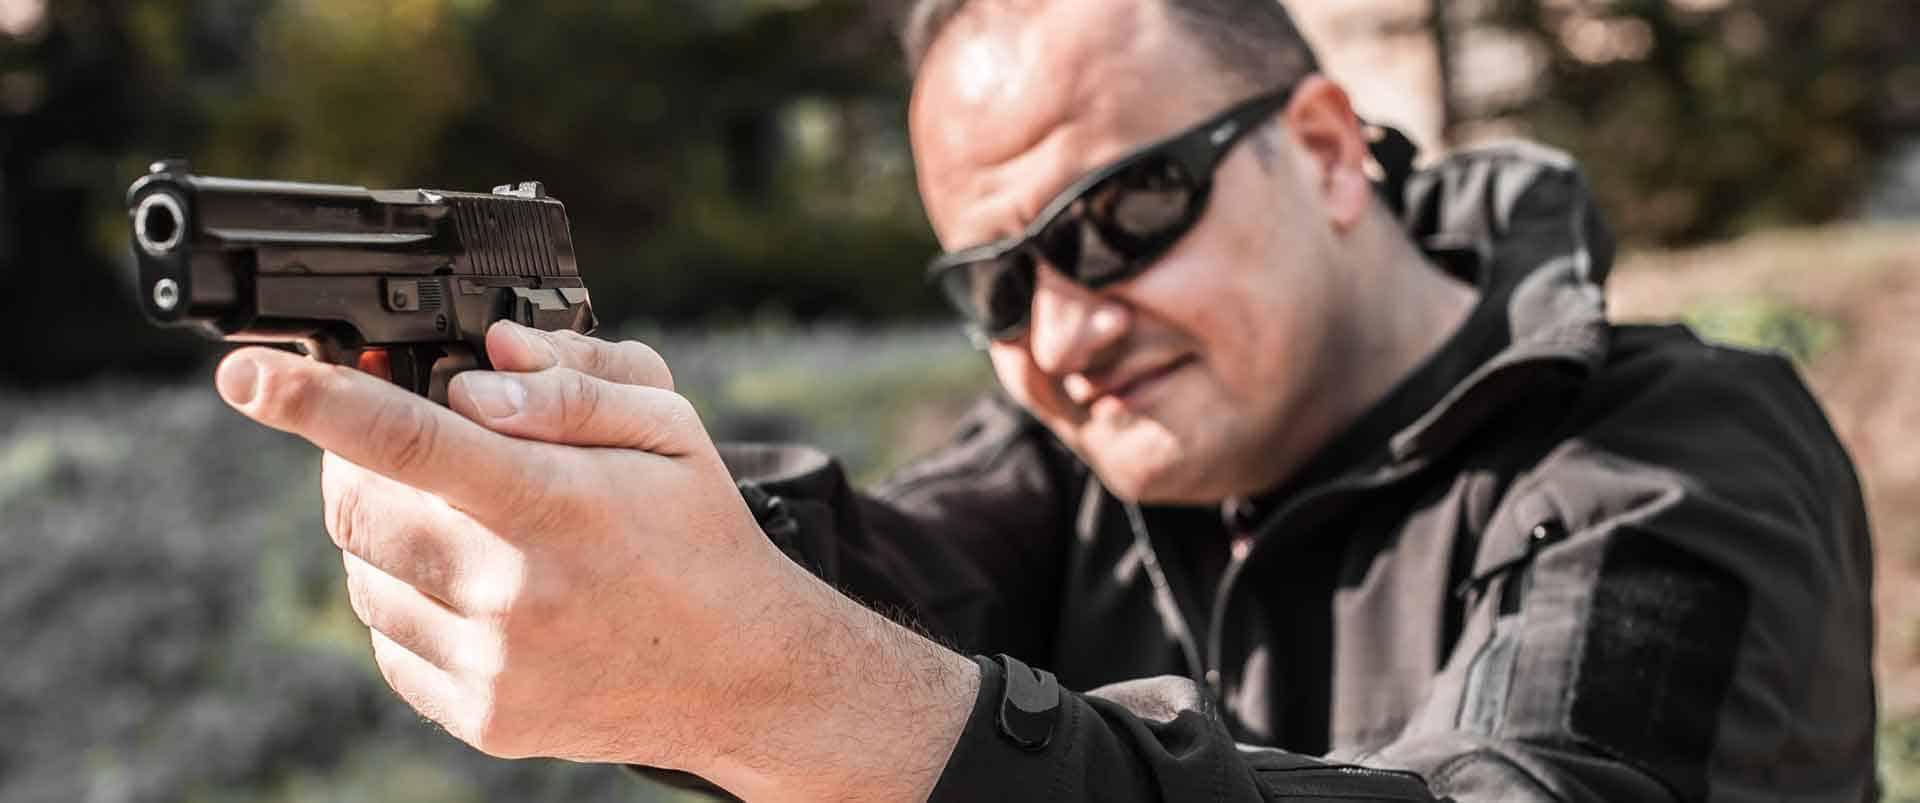 Armed bodyguard target practicing